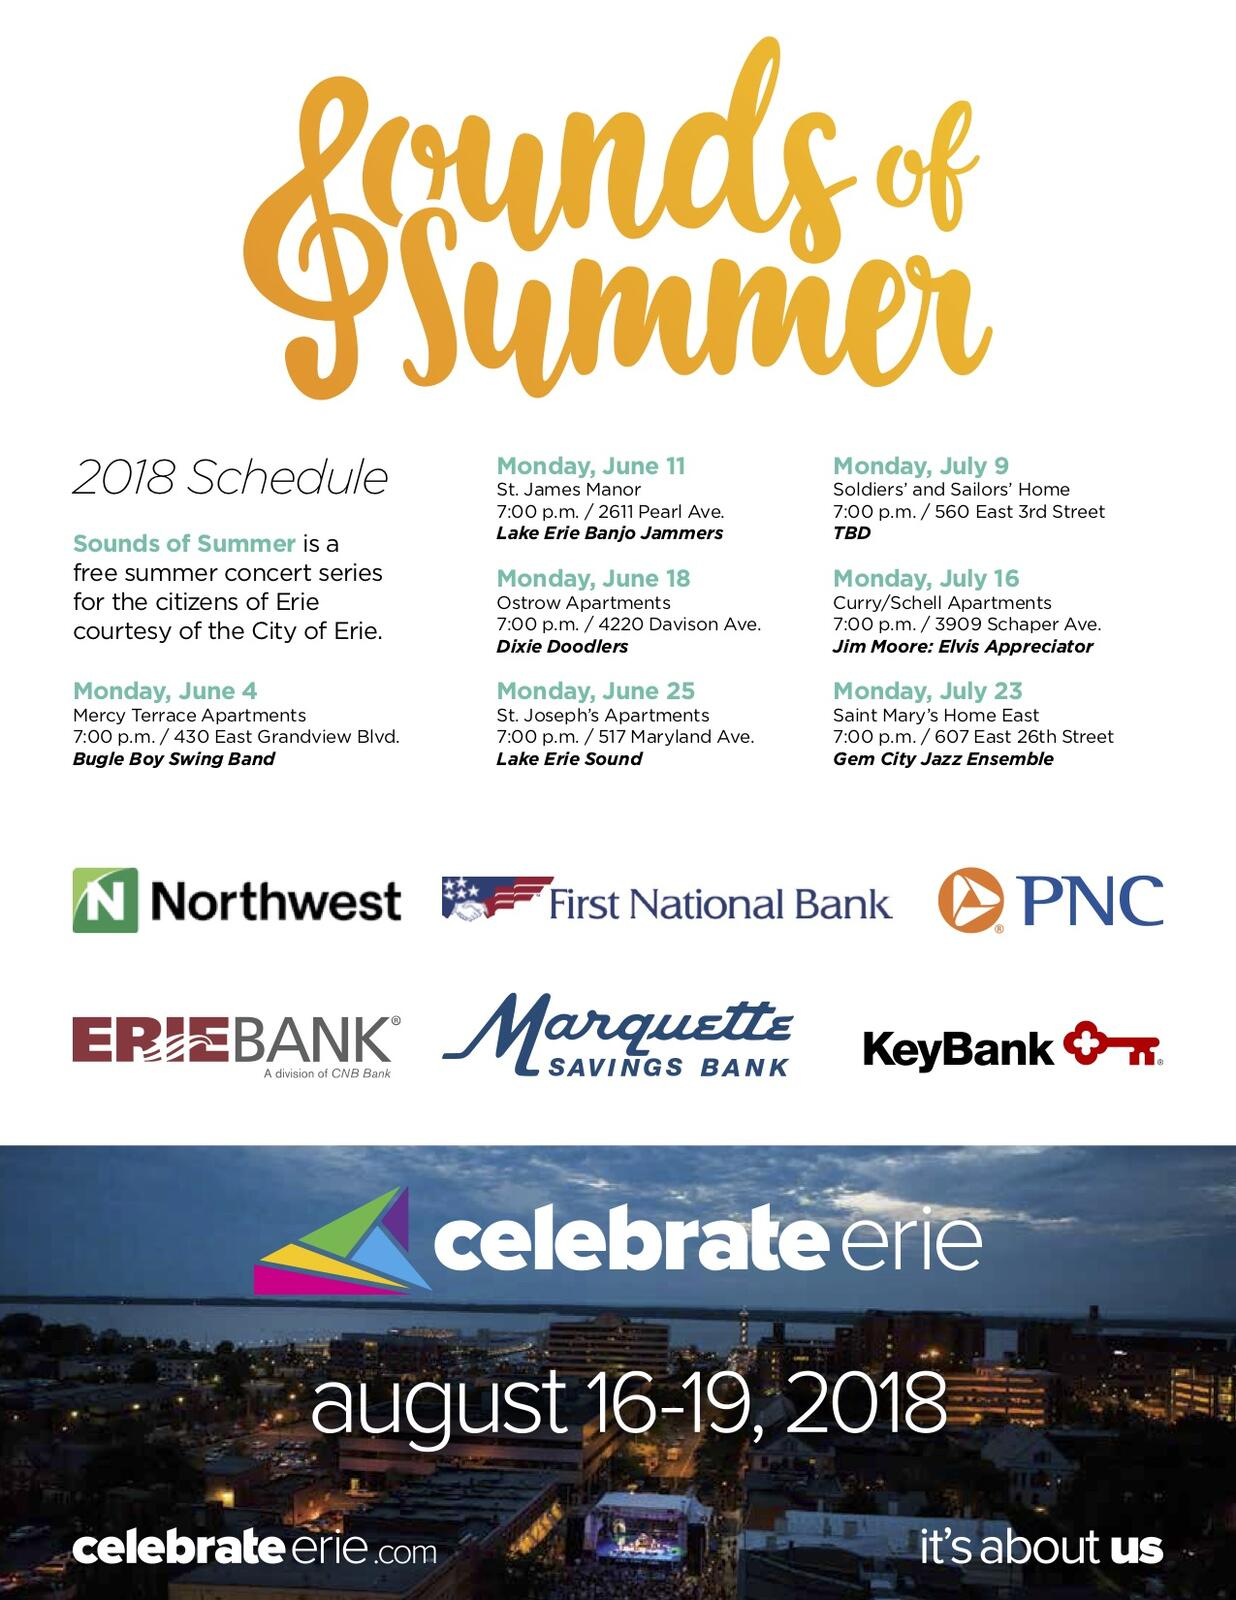 City of Erie 2018 Summer Parks & Recreation Programs (City